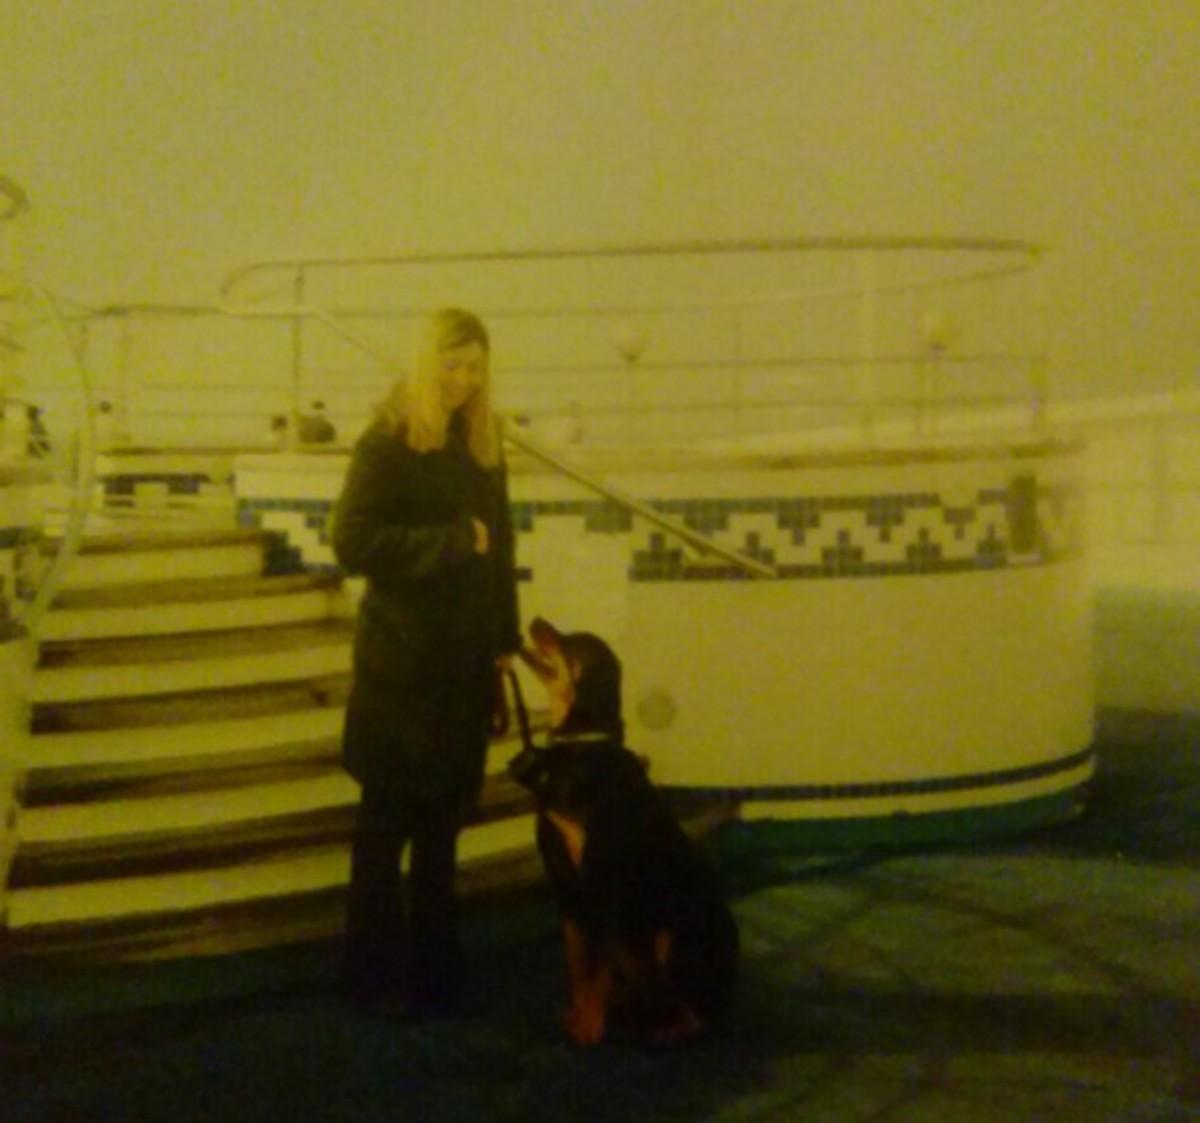 My dog on a cruise-like ship.